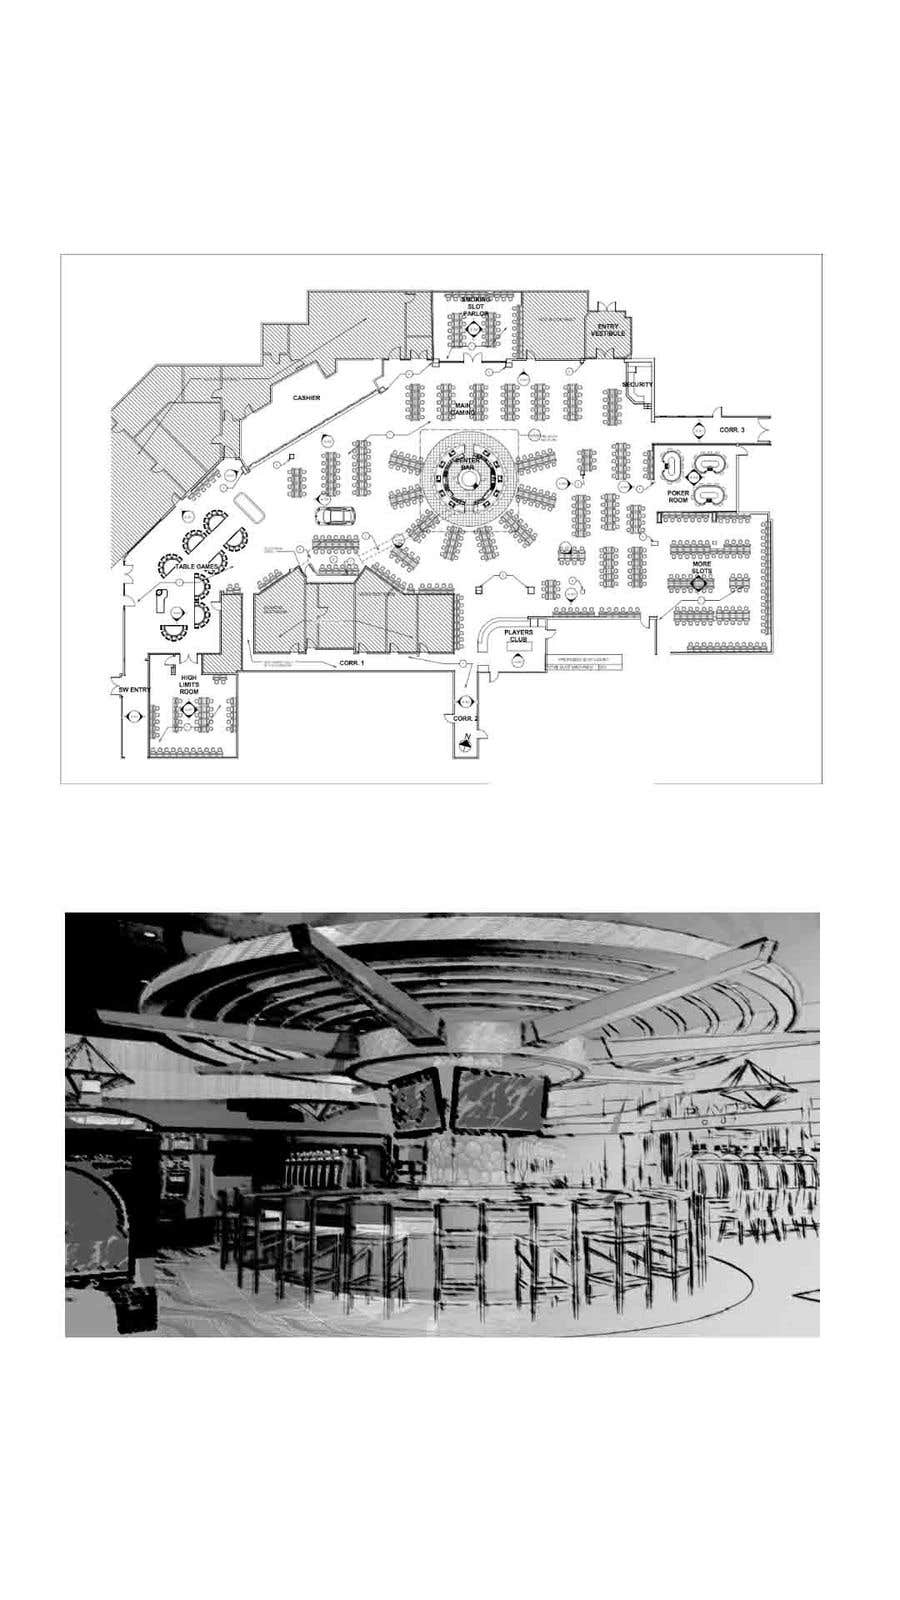 Konkurrenceindlæg #                                        10                                      for                                         Casino Floor Plan and concept design